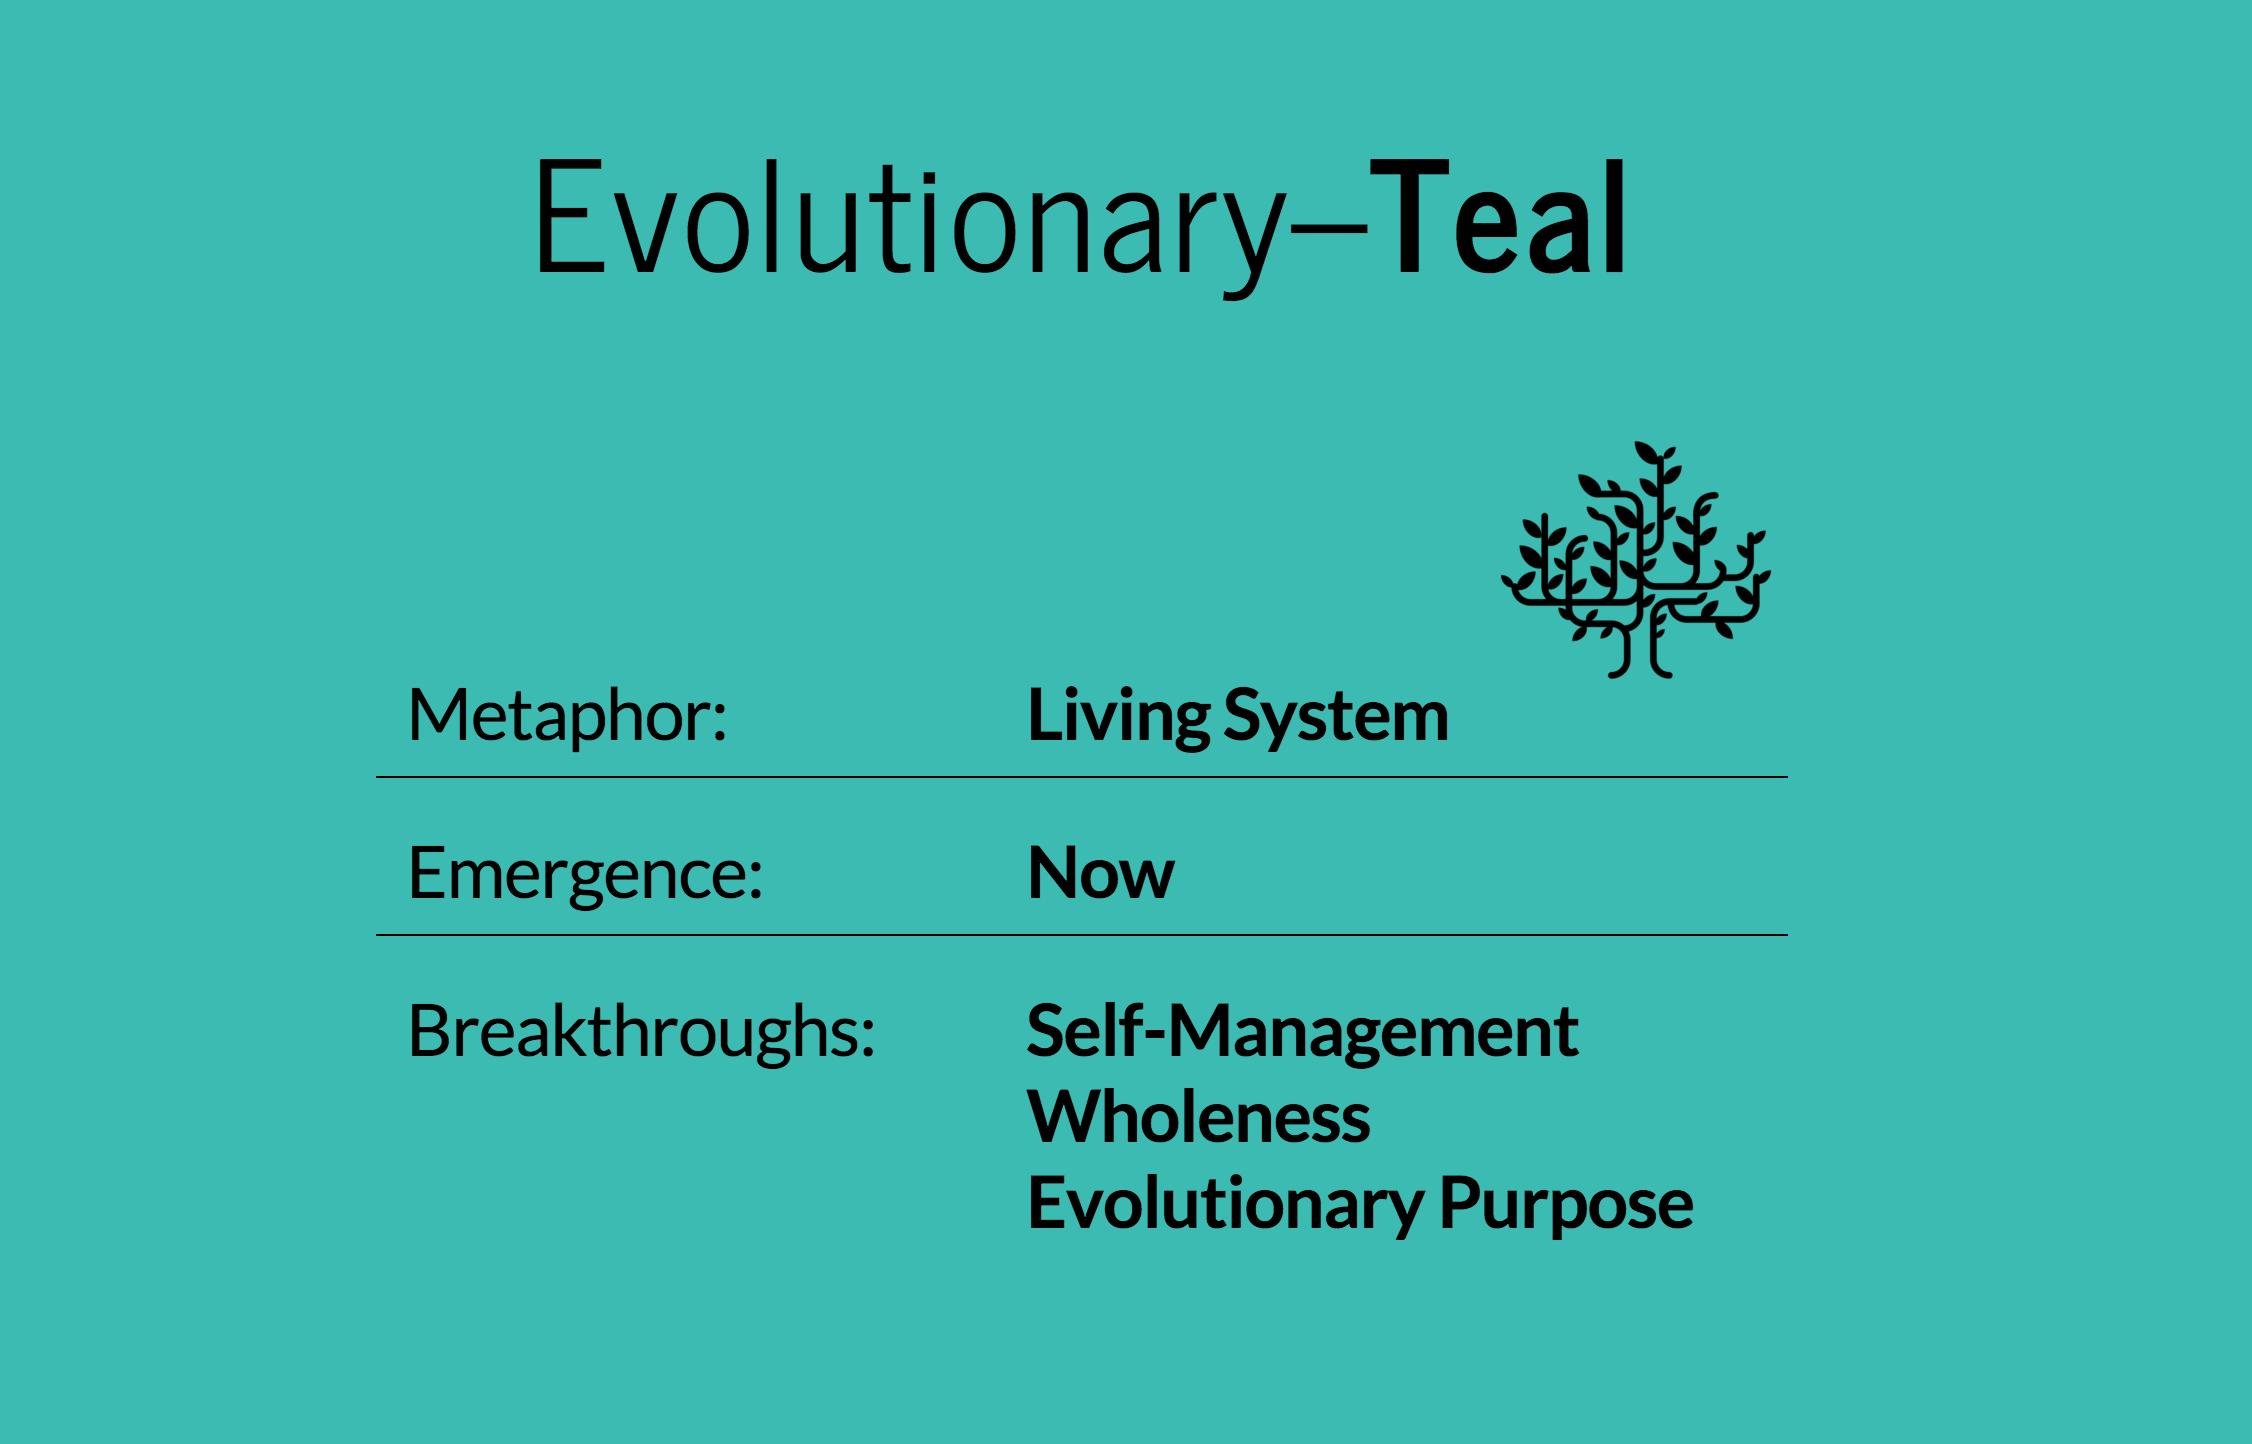 Teal company characteristics